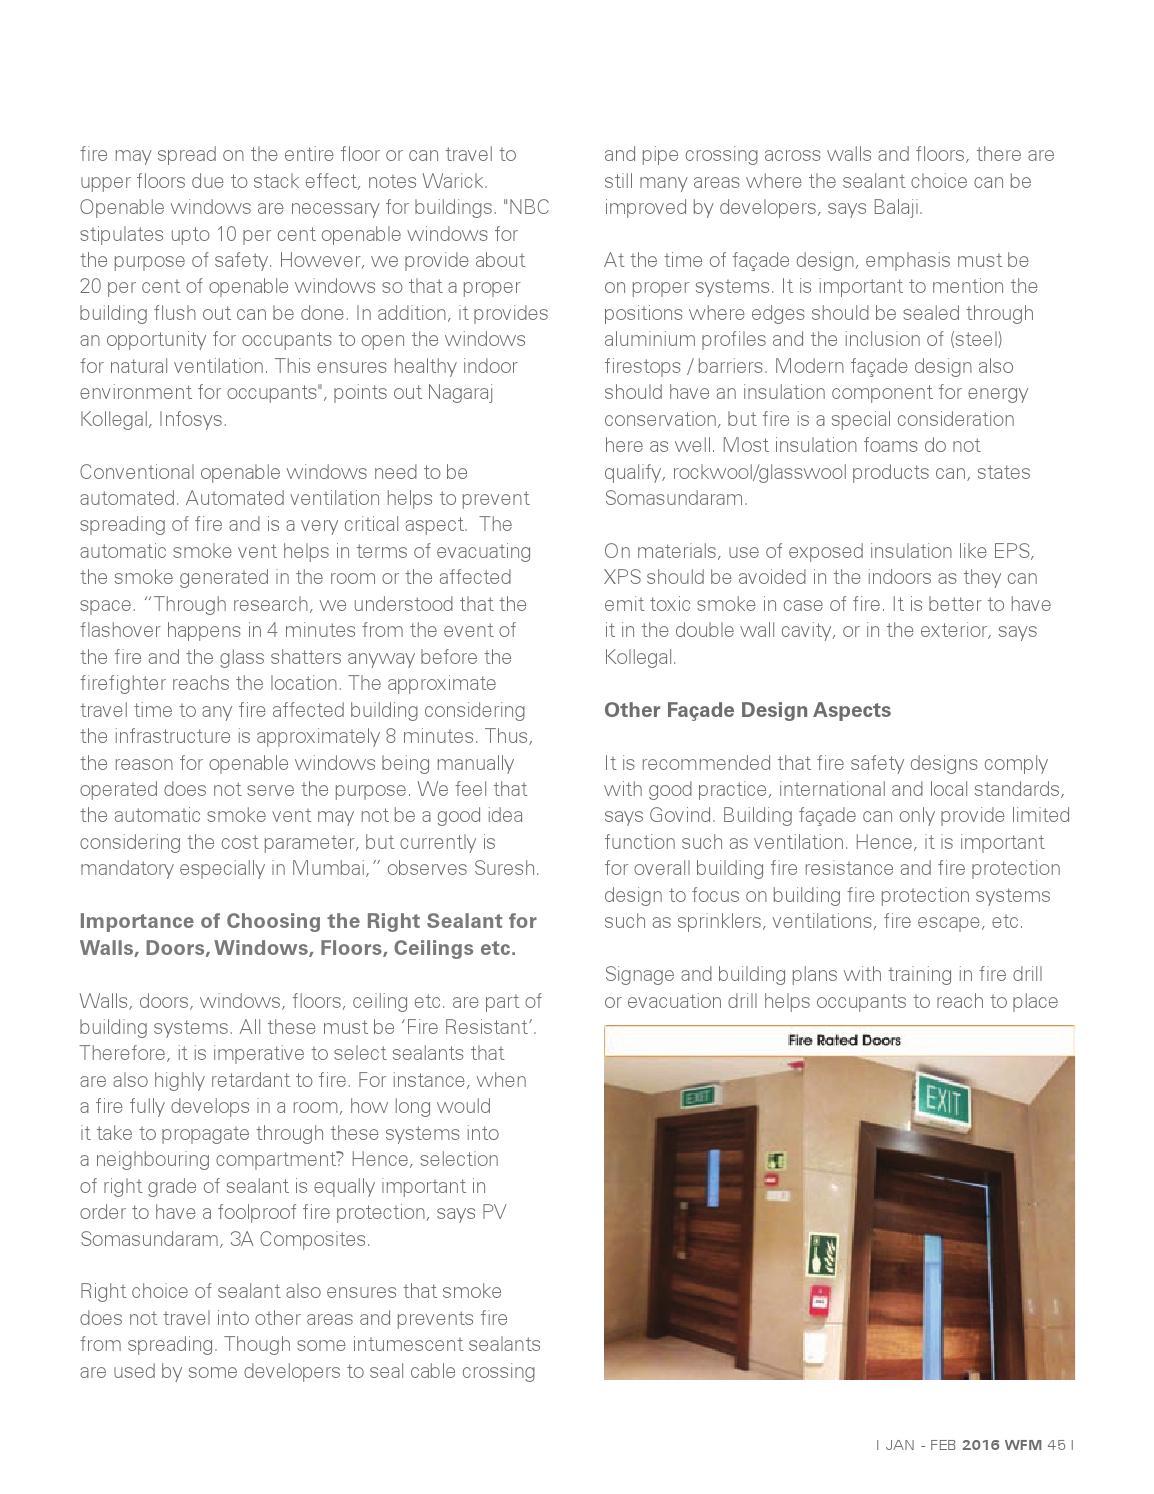 Window & Facade Magazine - January/February 2016 Issue by F & F